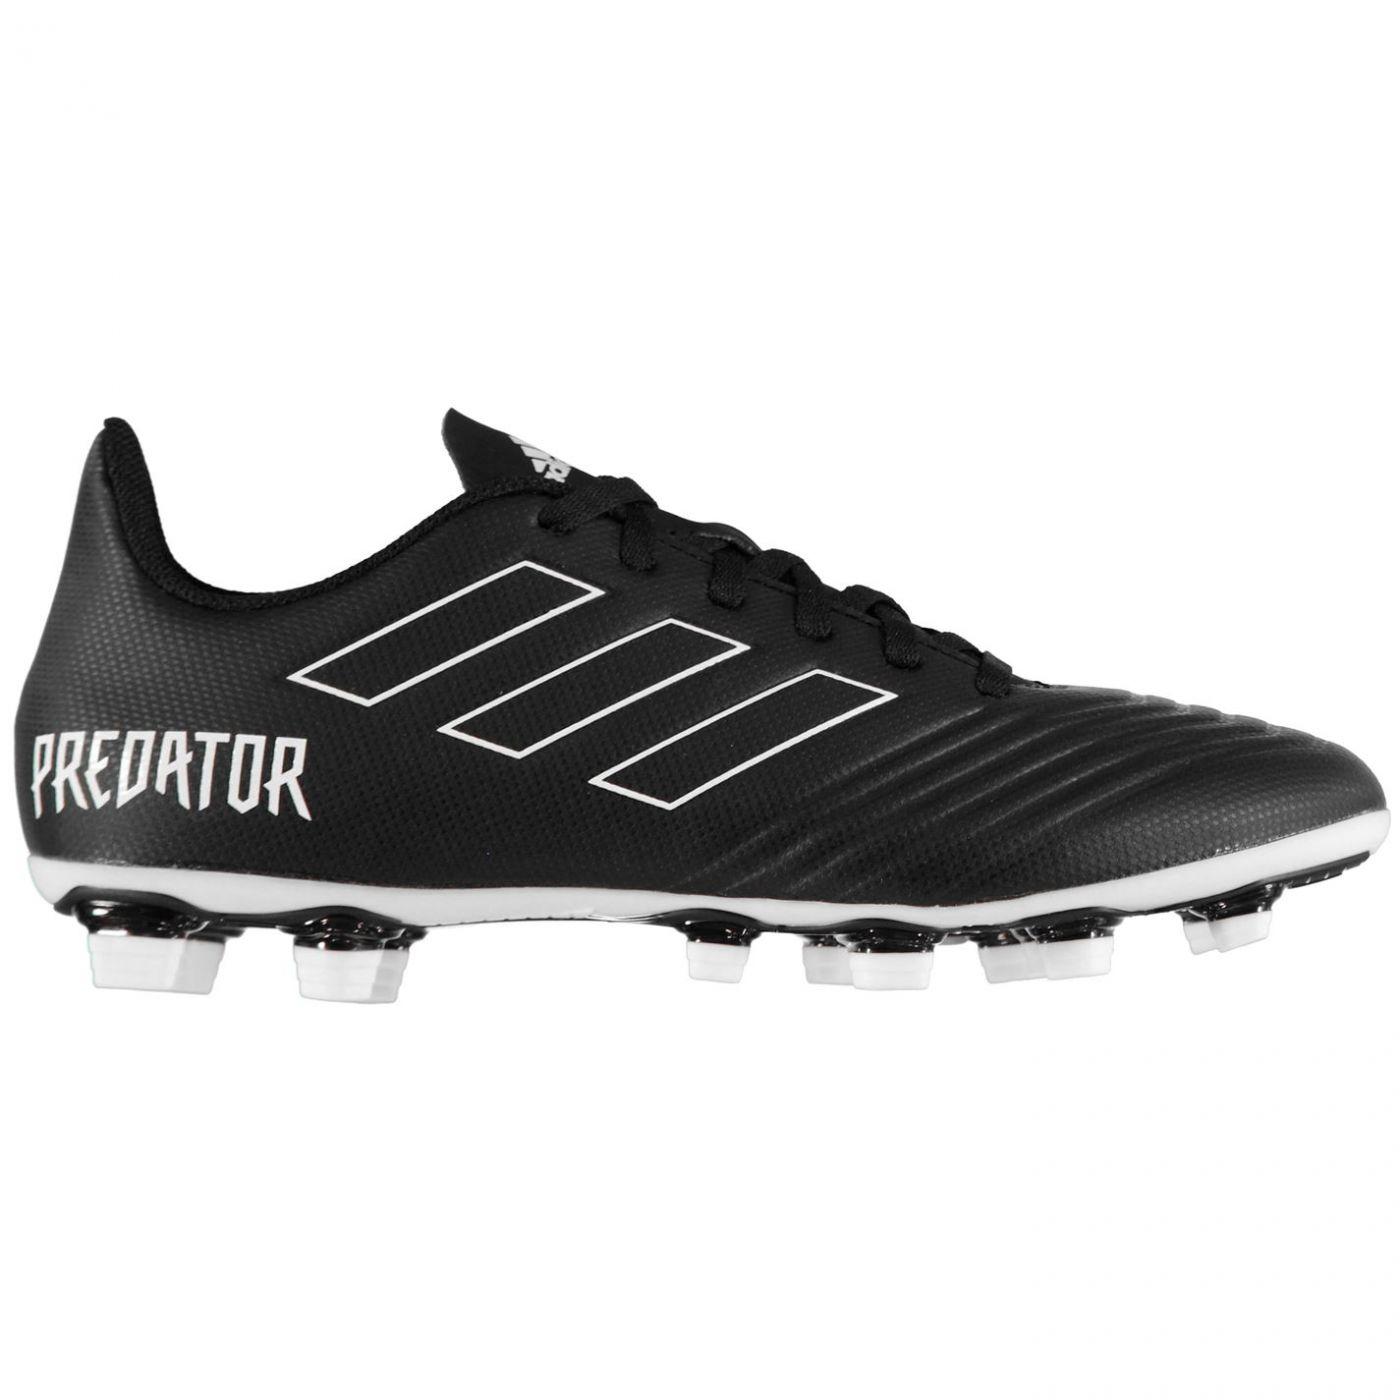 Adidas Predator 18.4 Mens FG Football Boots